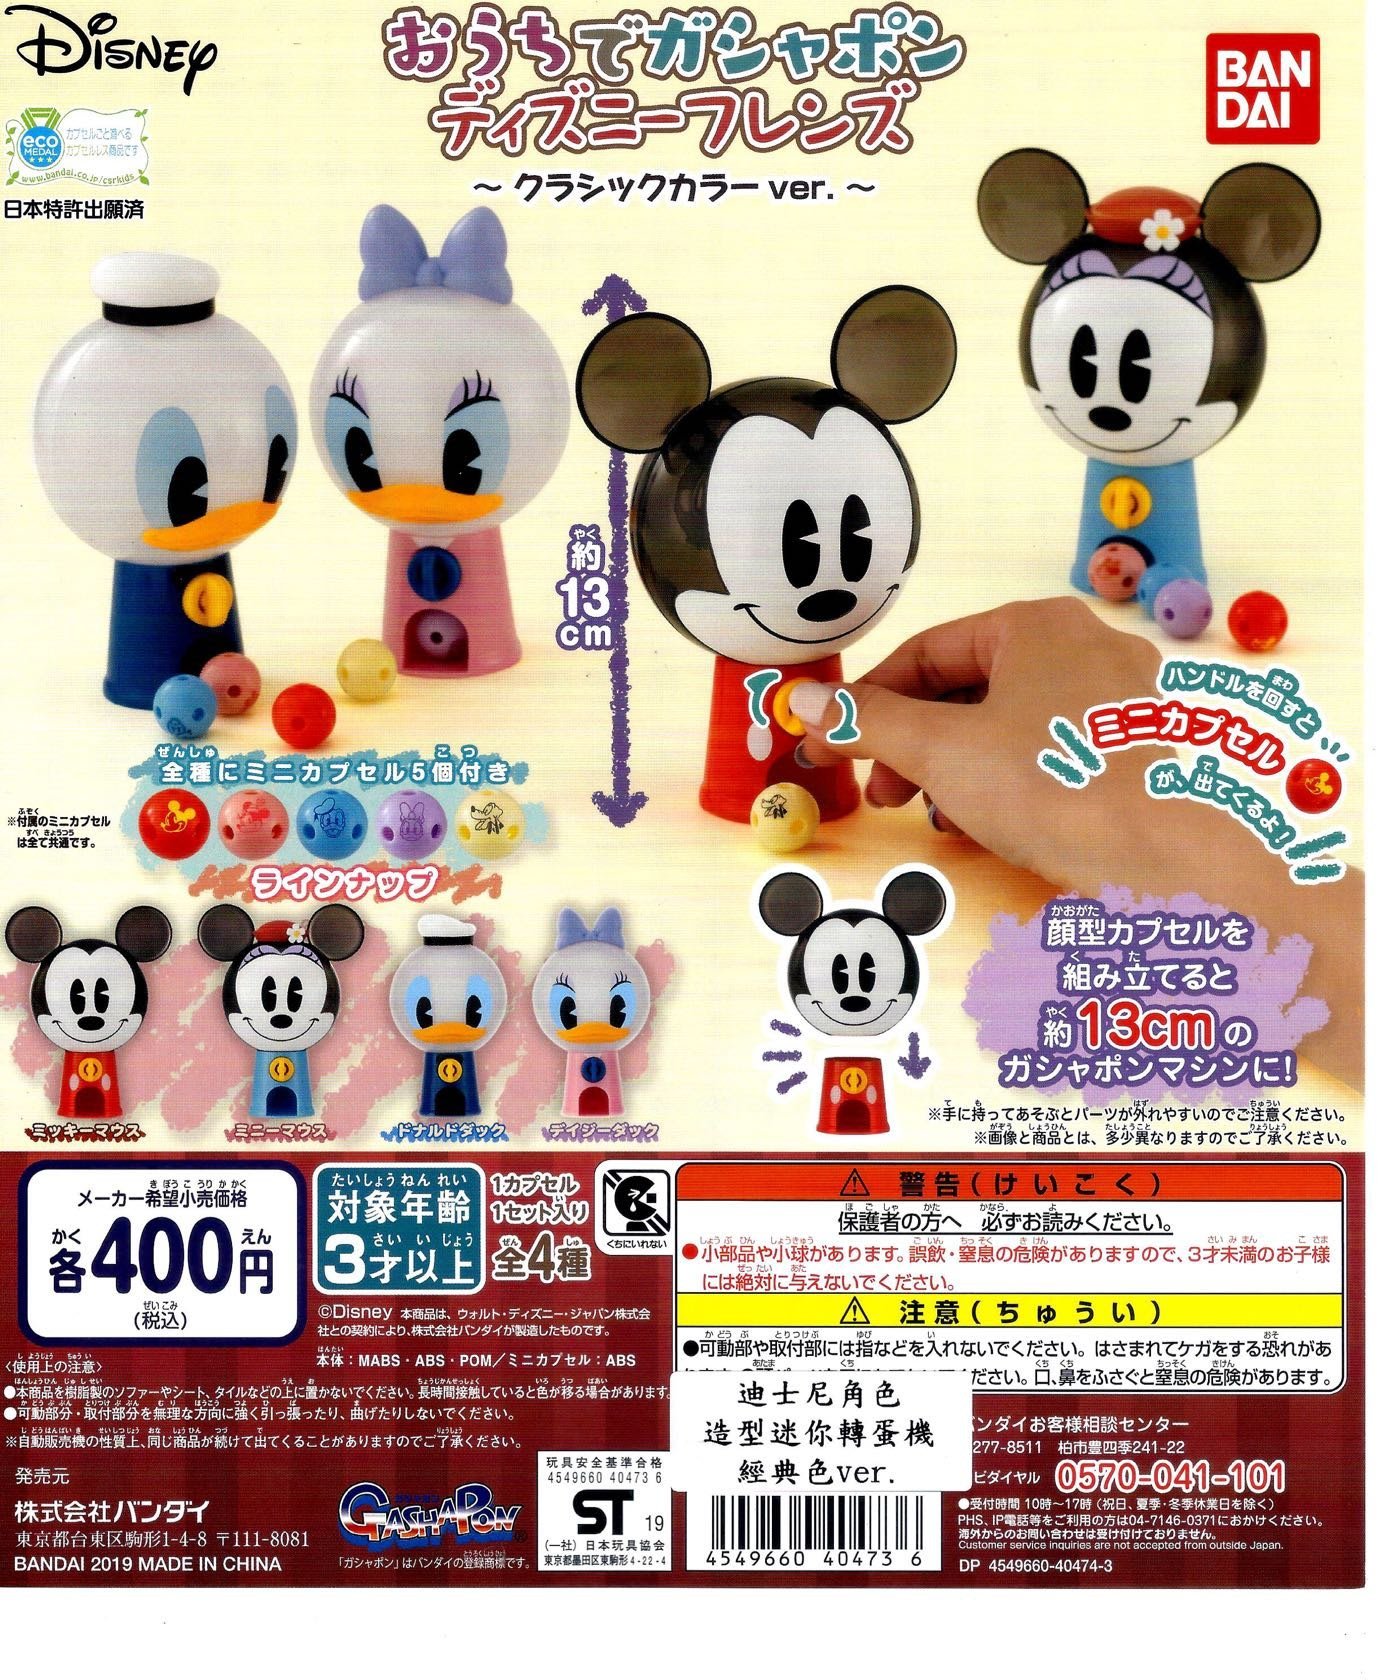 BANDAI迪士尼角色造型迷你扭蛋機經典色ver.-原裝整袋價- 現貨日本空運版-整袋30顆裝.整袋賣2700元